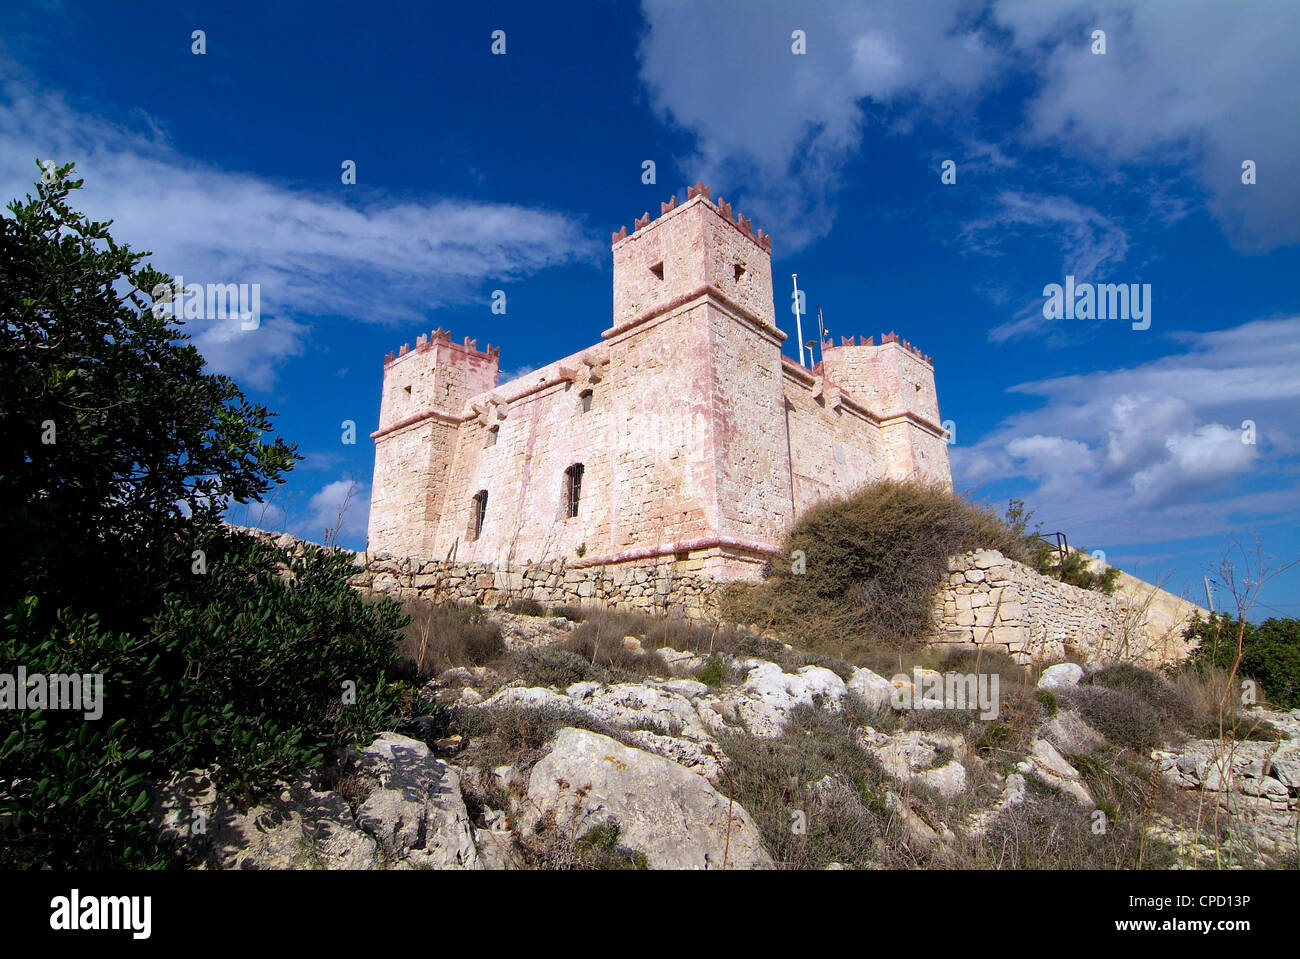 Red Tower, Marfa Ridge, Malta, Mediterranean, Europe - Stock Image